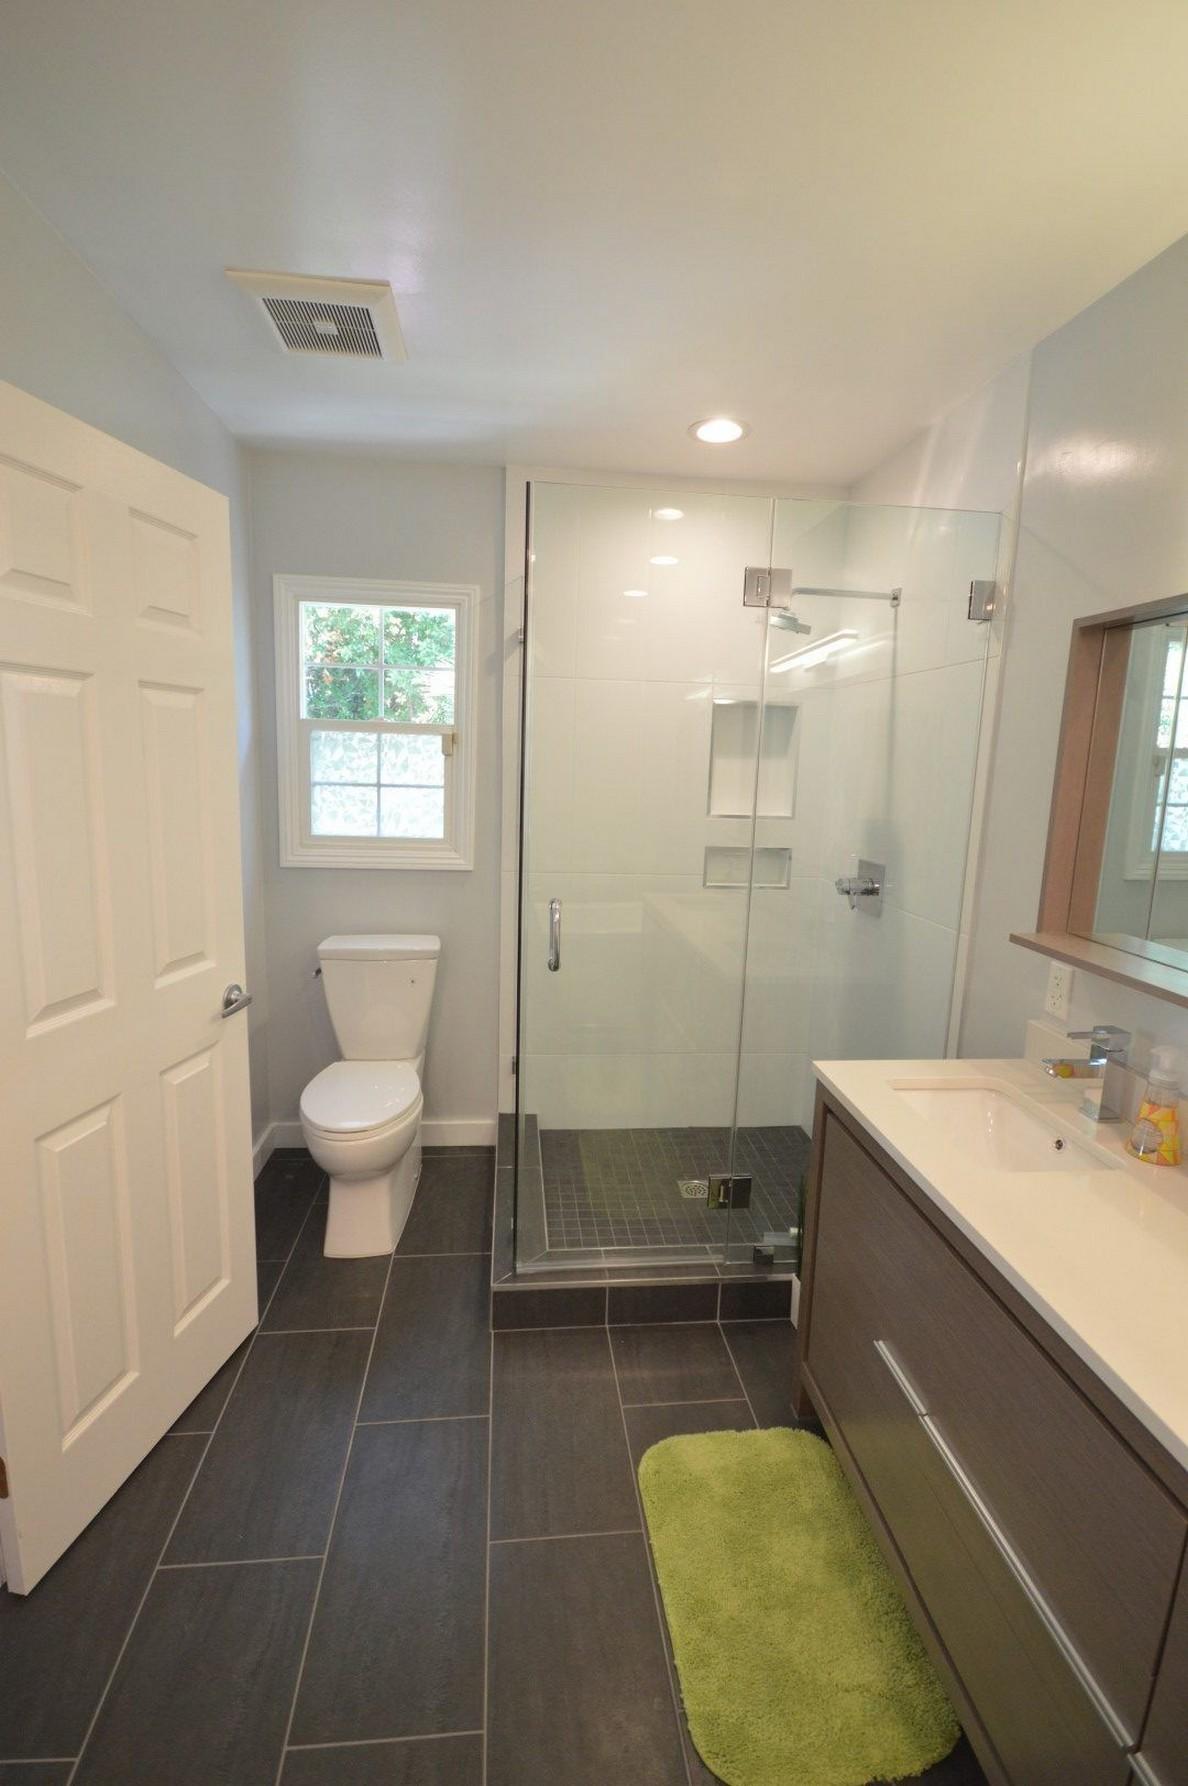 80 Bathroom Renovations Tips Home Decor 66